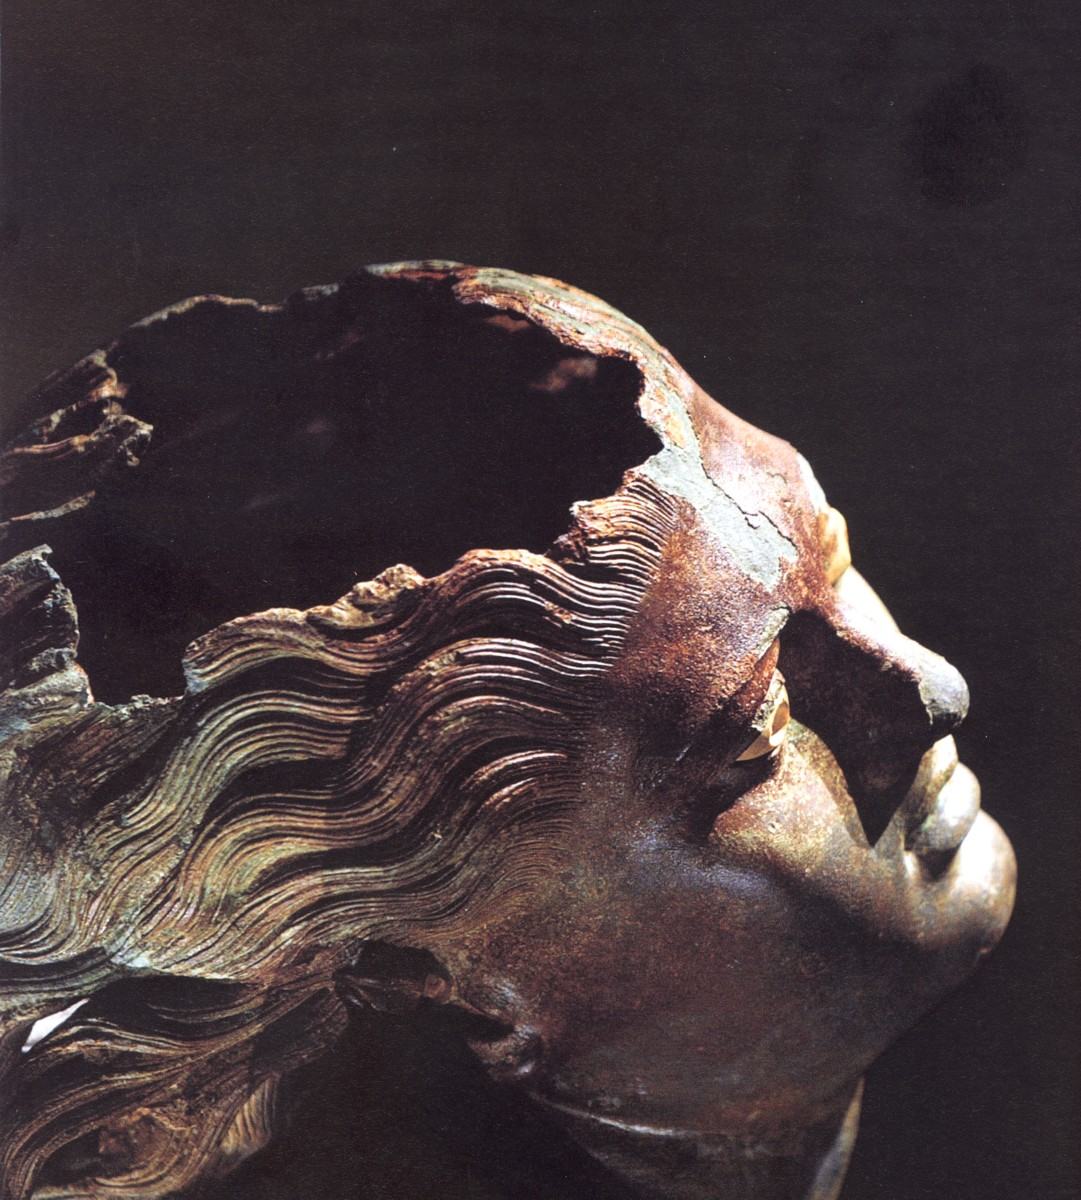 Satyr3 Kate Winslet 20110131 Events Premiere Revolutionary Road 15Dec08 19691